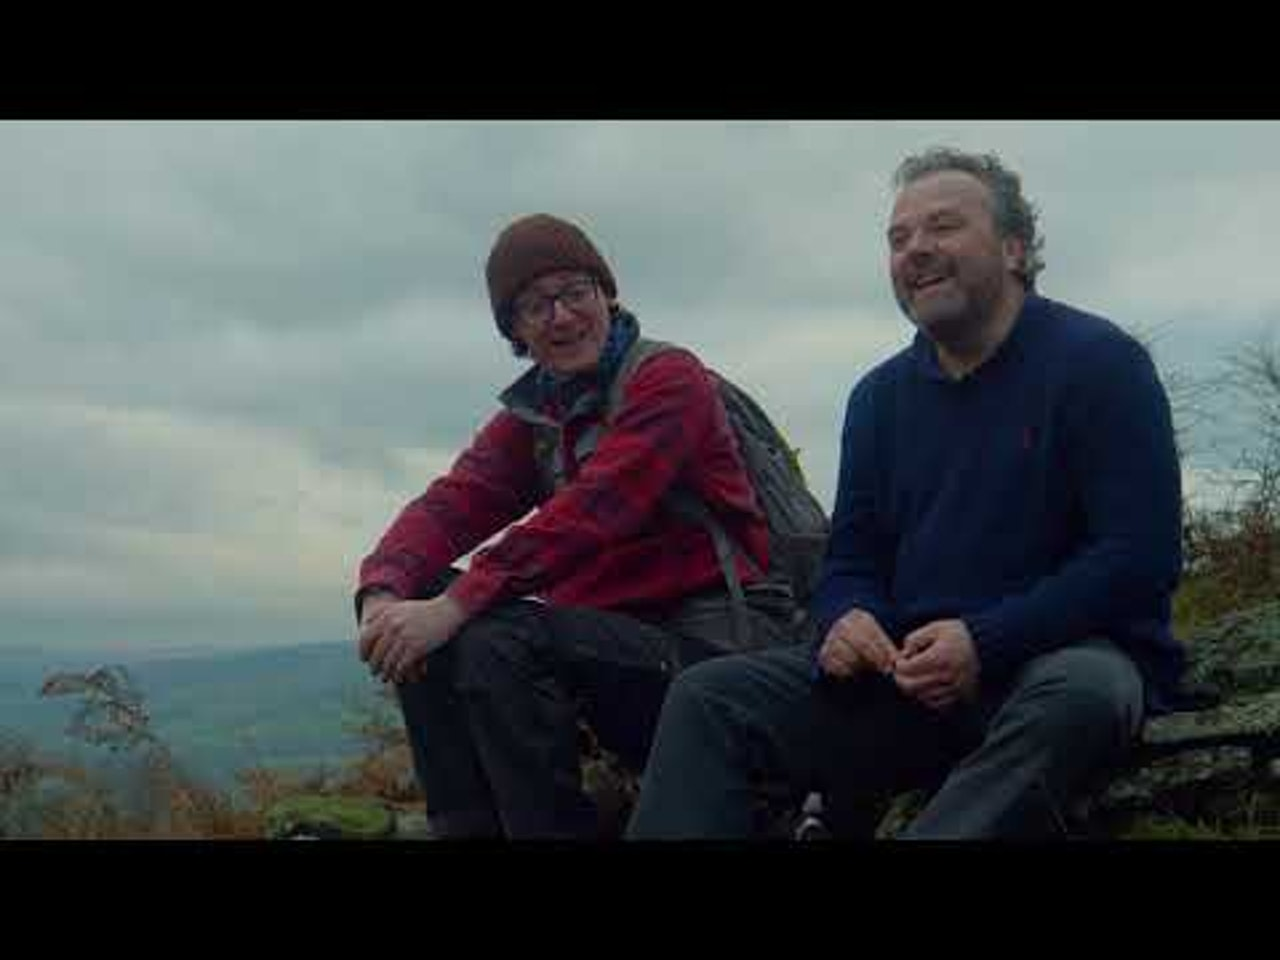 4. Hal Cruttenden in the Peak District